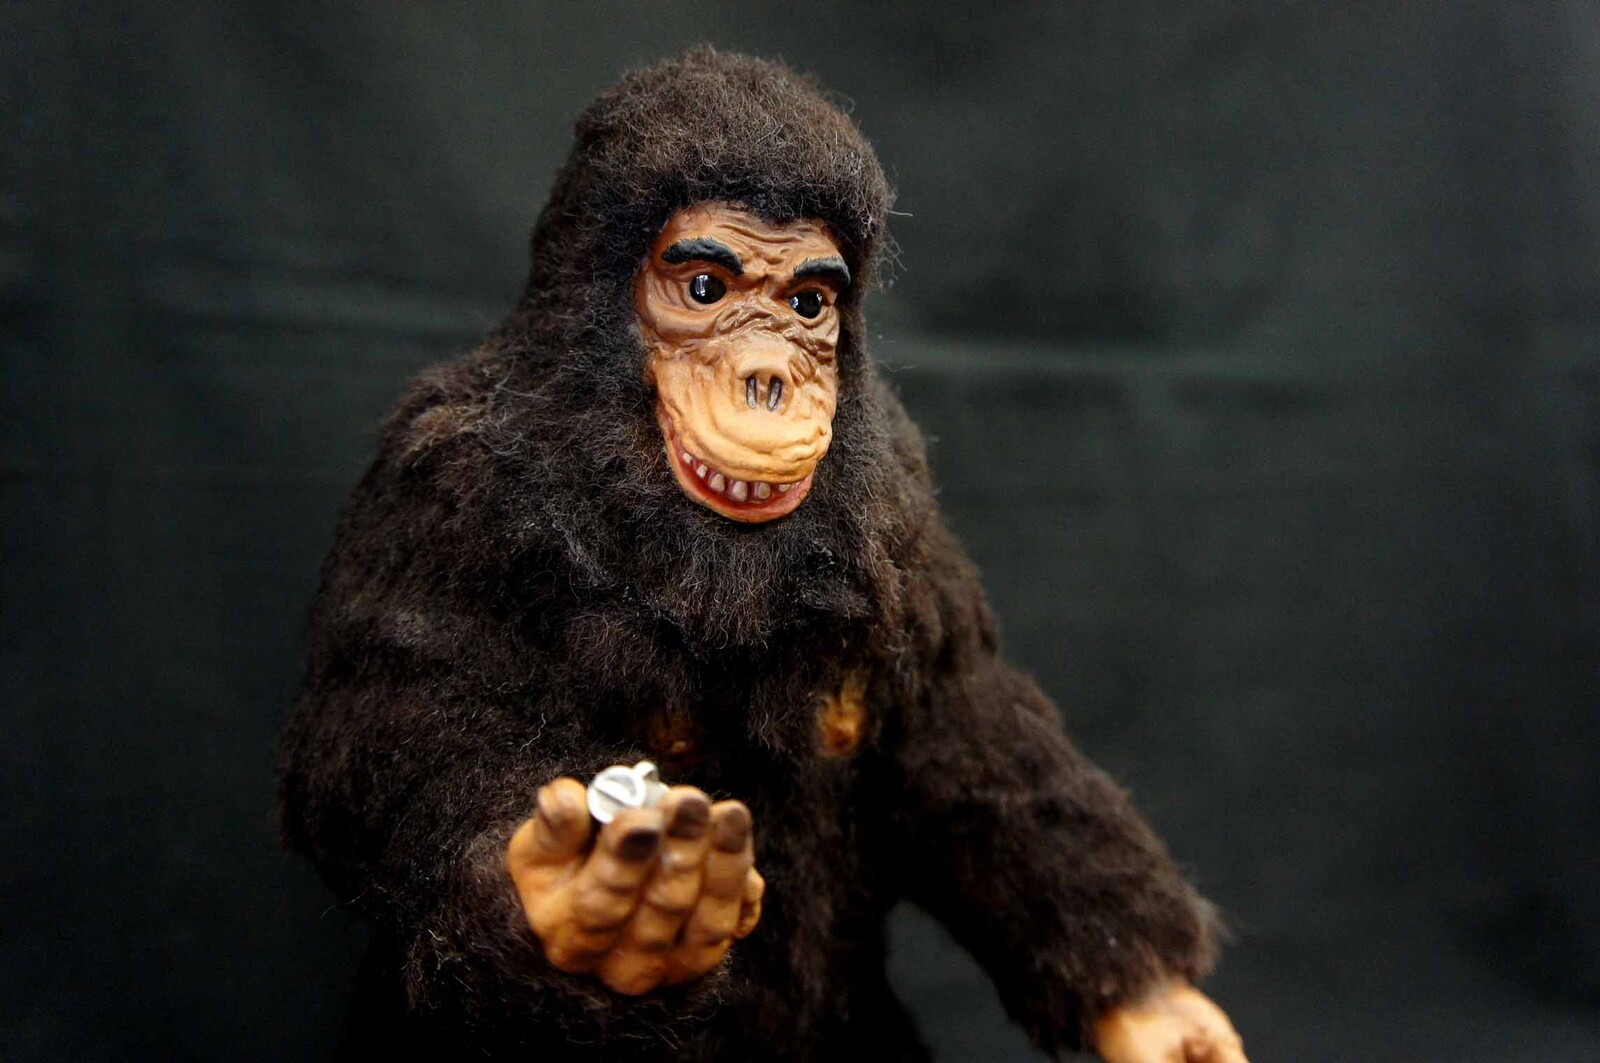 Ultra Q Goro Art Statue  ウルトラQ : 第2話 五郎とゴロー  https://www.solodart.club/